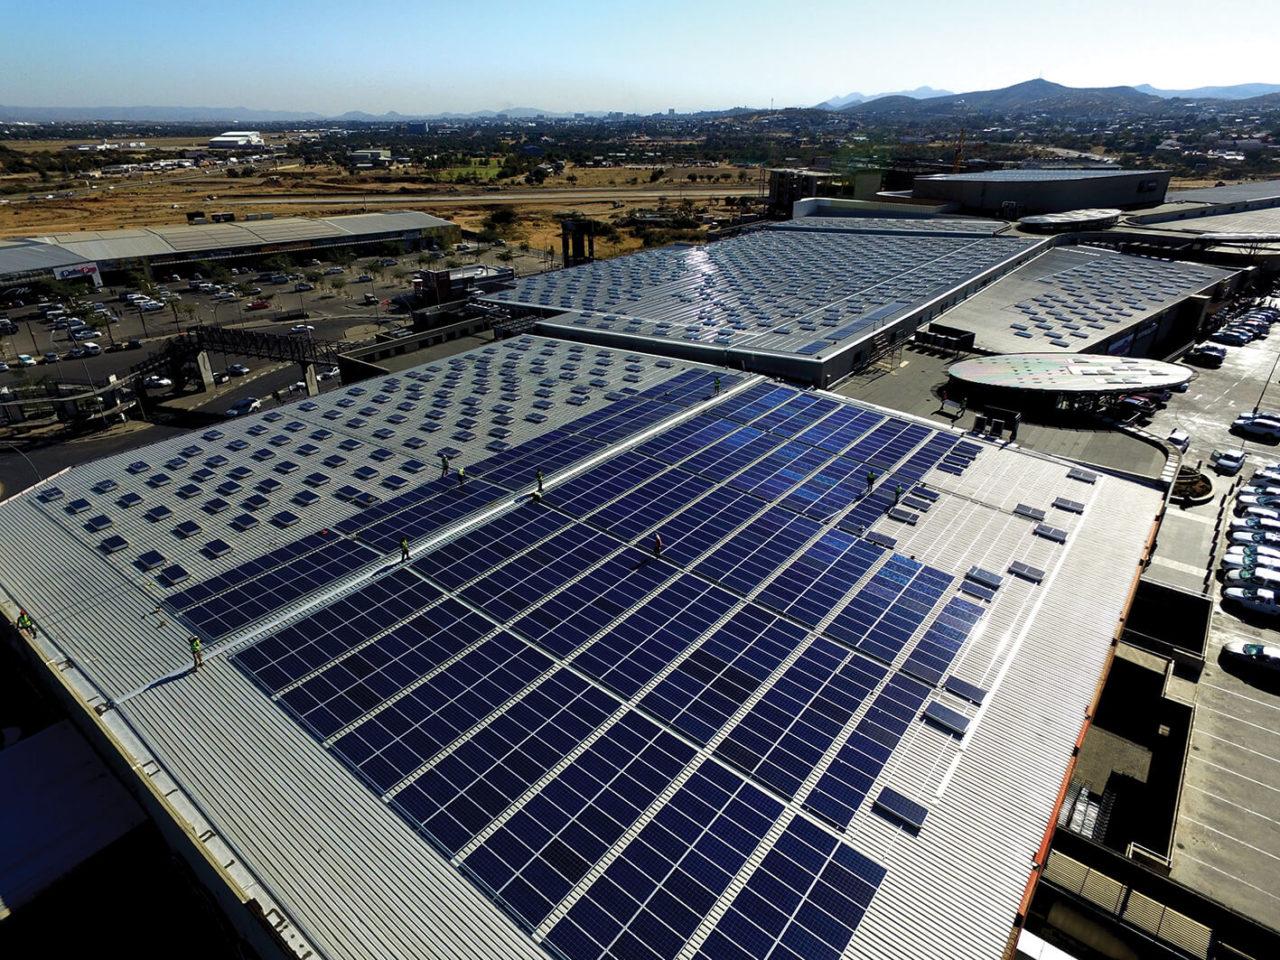 https://universalkraft.com/wp-content/uploads/2018/09/rooftop-solar-shopping-copenhagen-1280x960.jpg